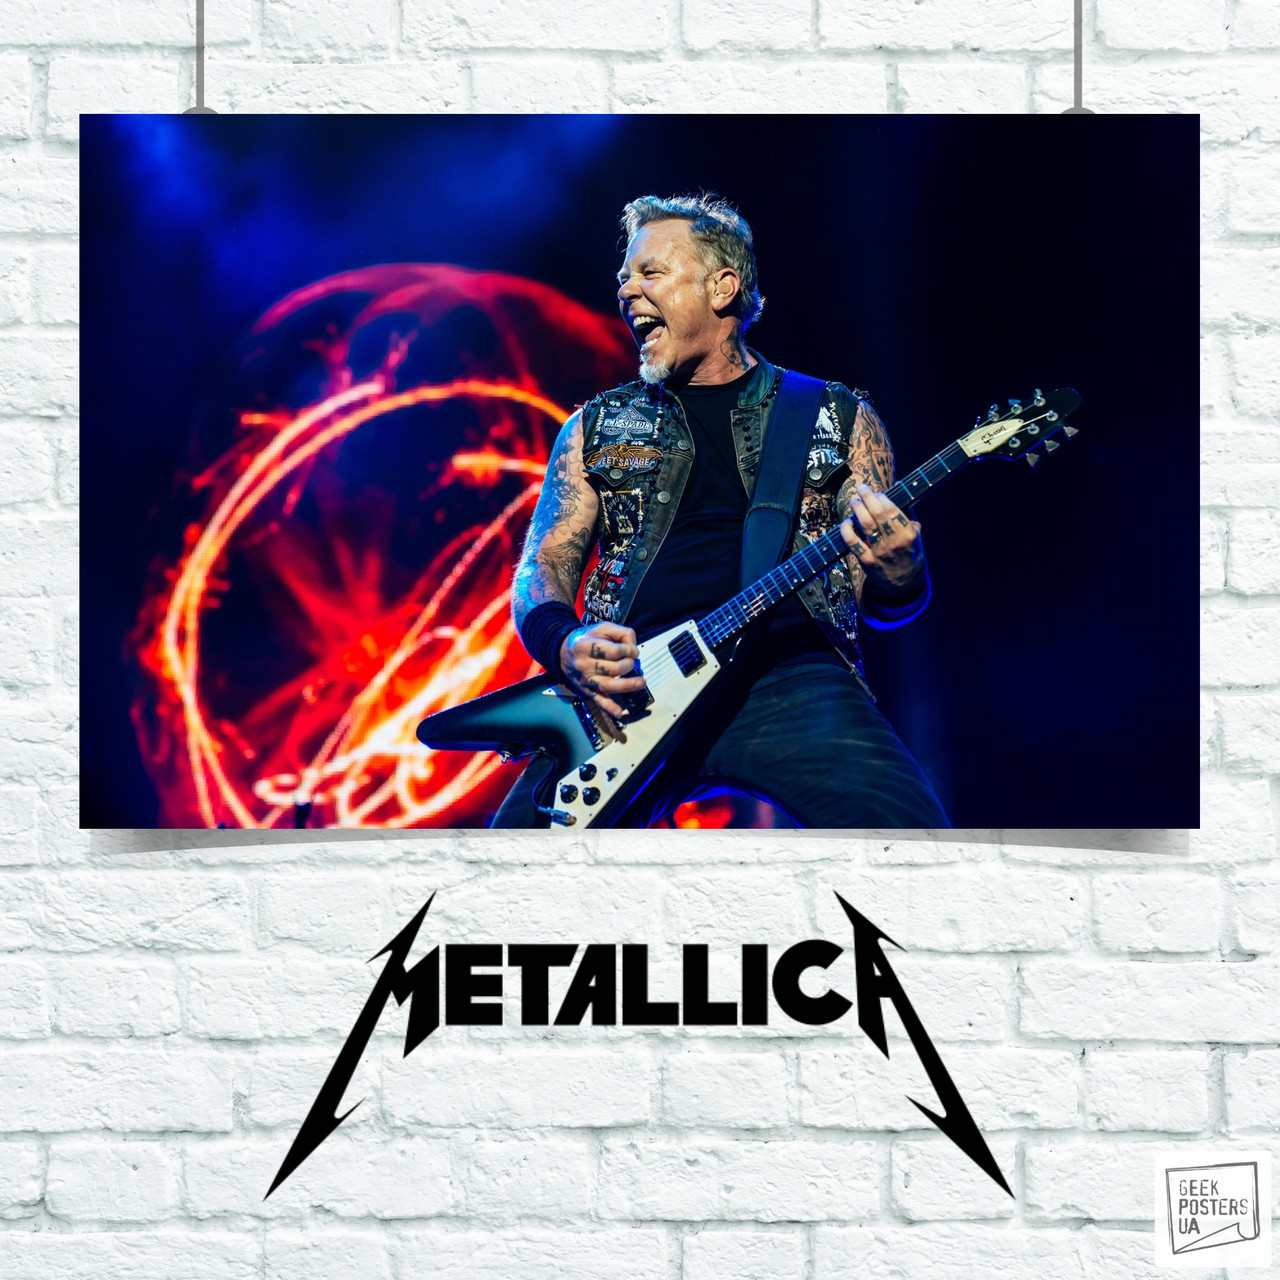 Постер Metallica, Металлика. Размер 60x42см (A2). Глянцевая бумага